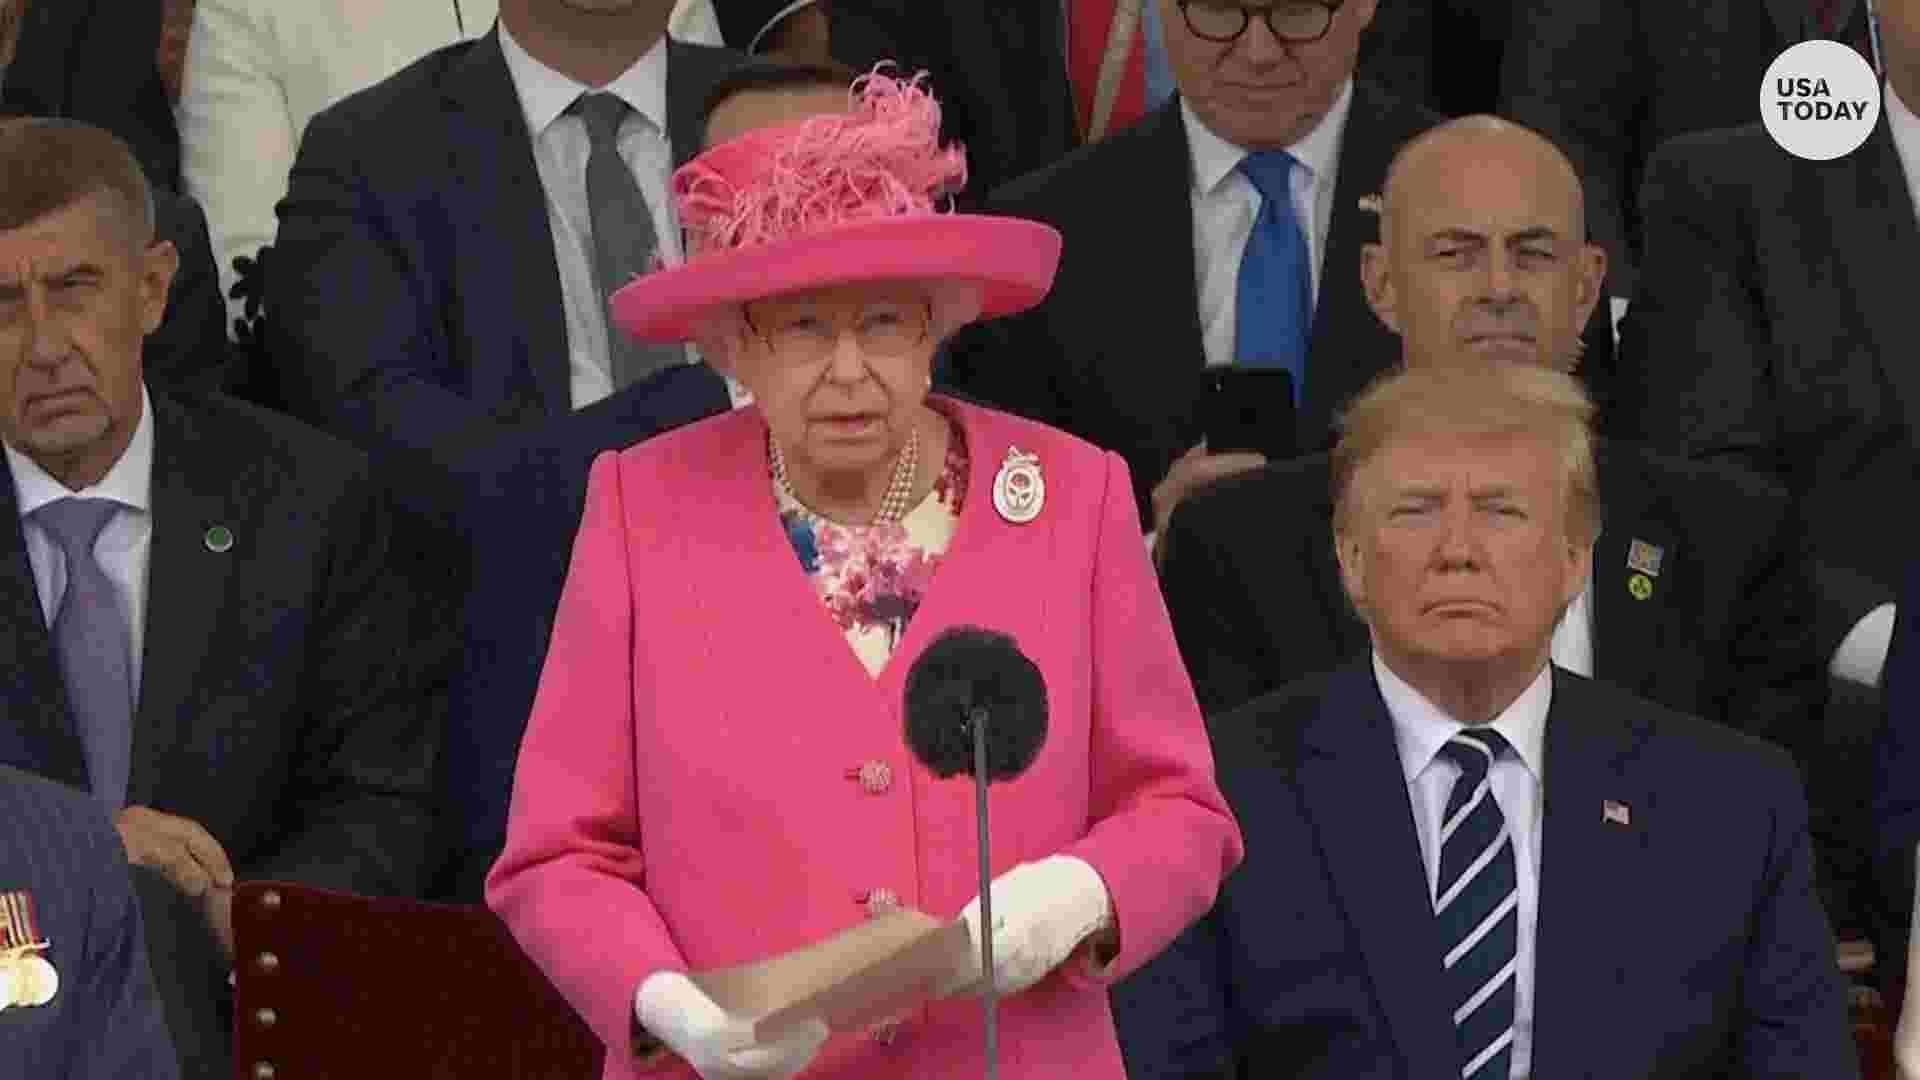 3f2b89d0e491 Trump reads FDR's D-Day prayer as Queen Elizabeth II, world leaders  remember World War II Normandy landing